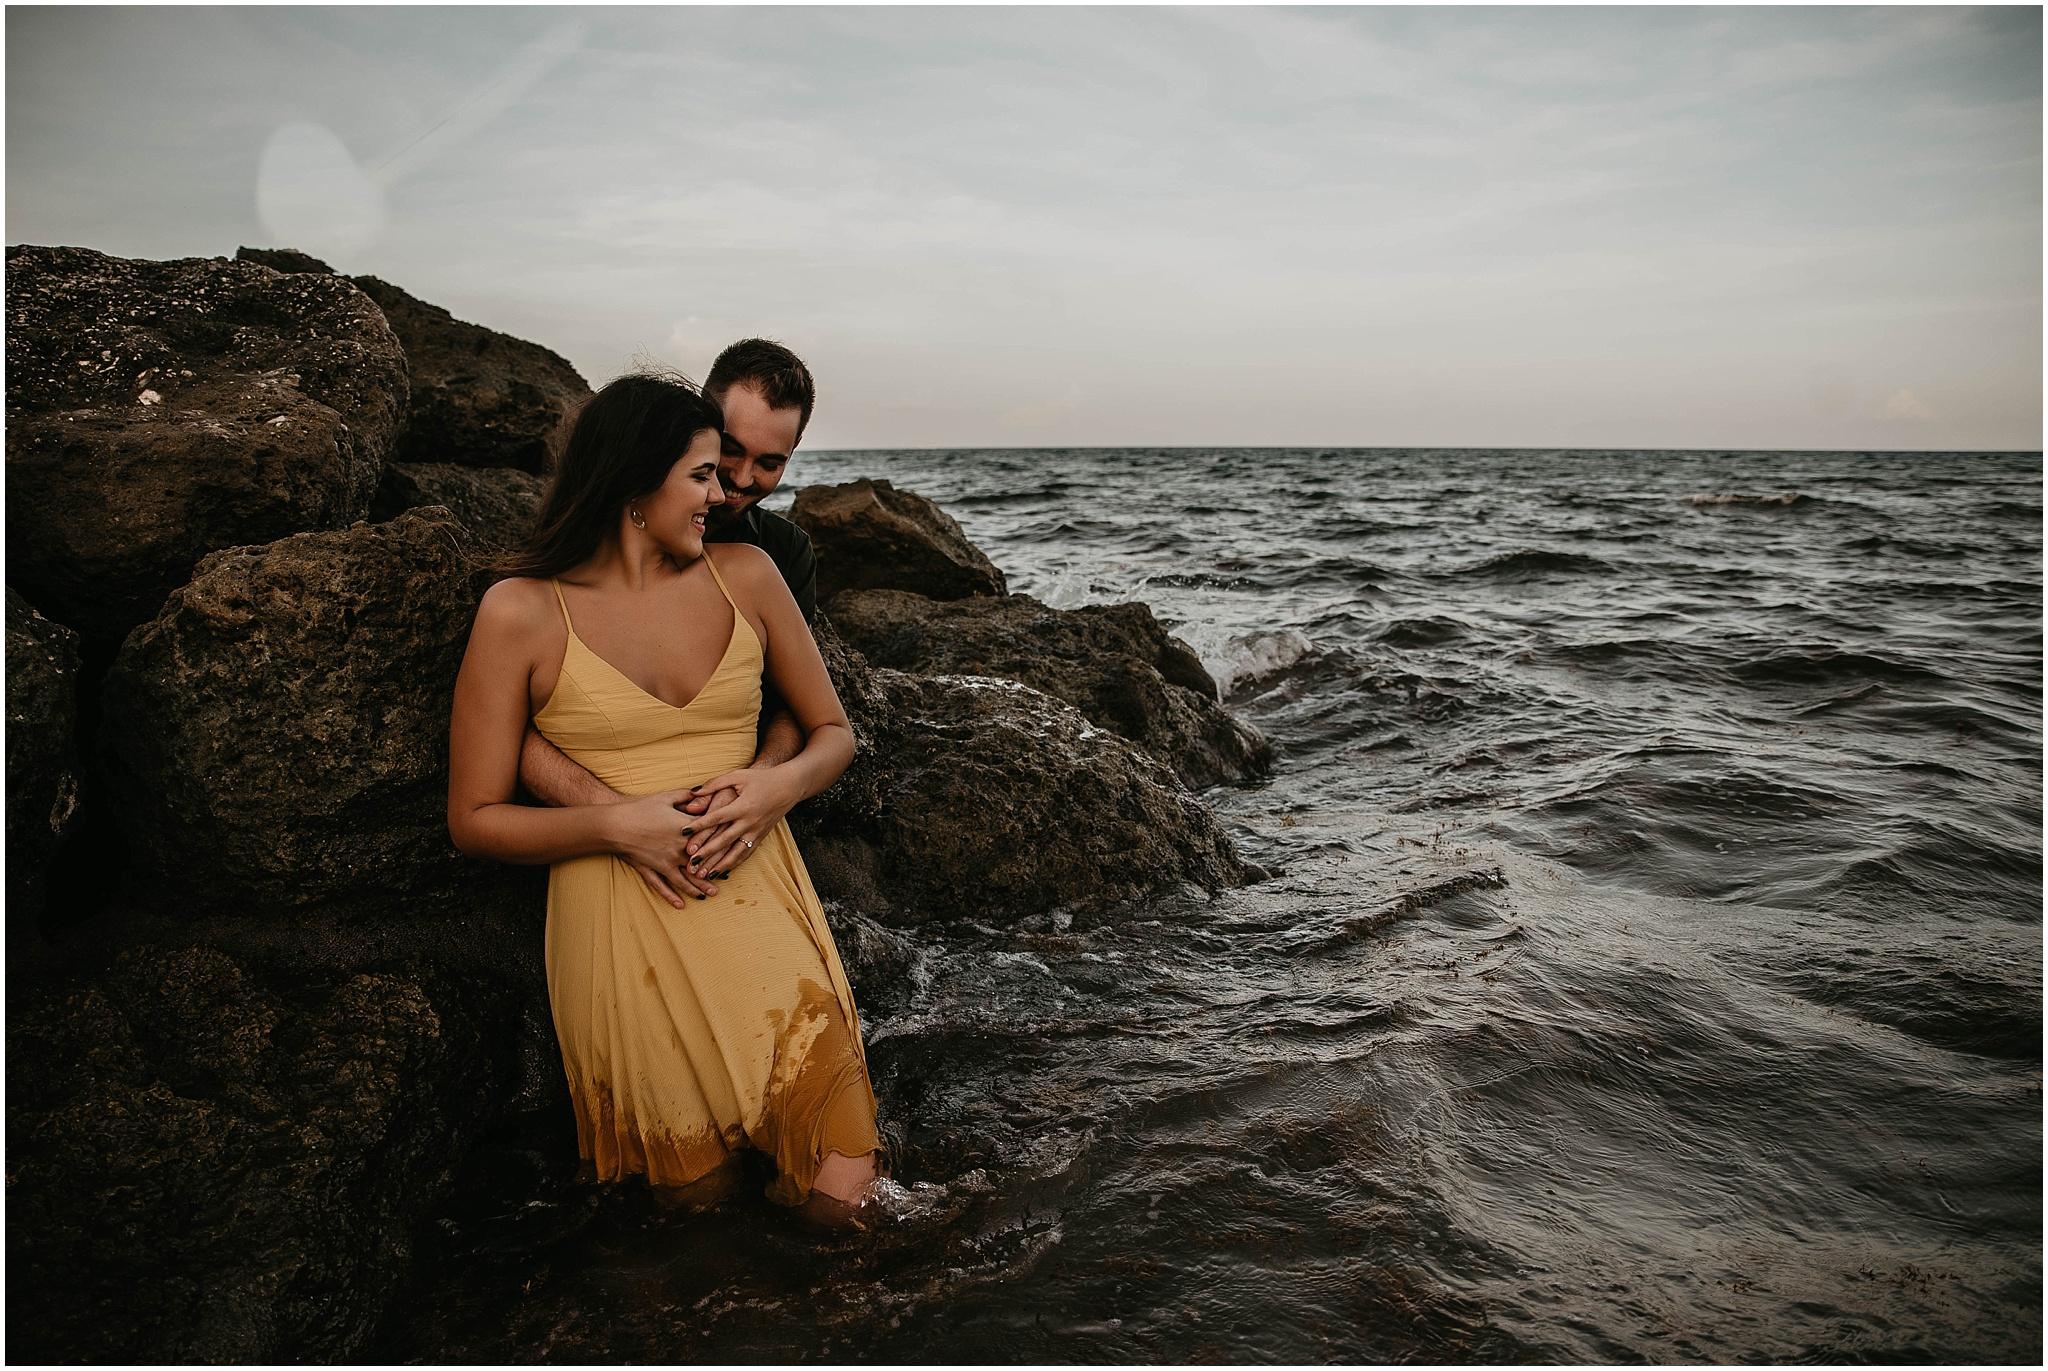 Worth-Avenue-Palm-Beach-engagement-photographer_0019.jpg